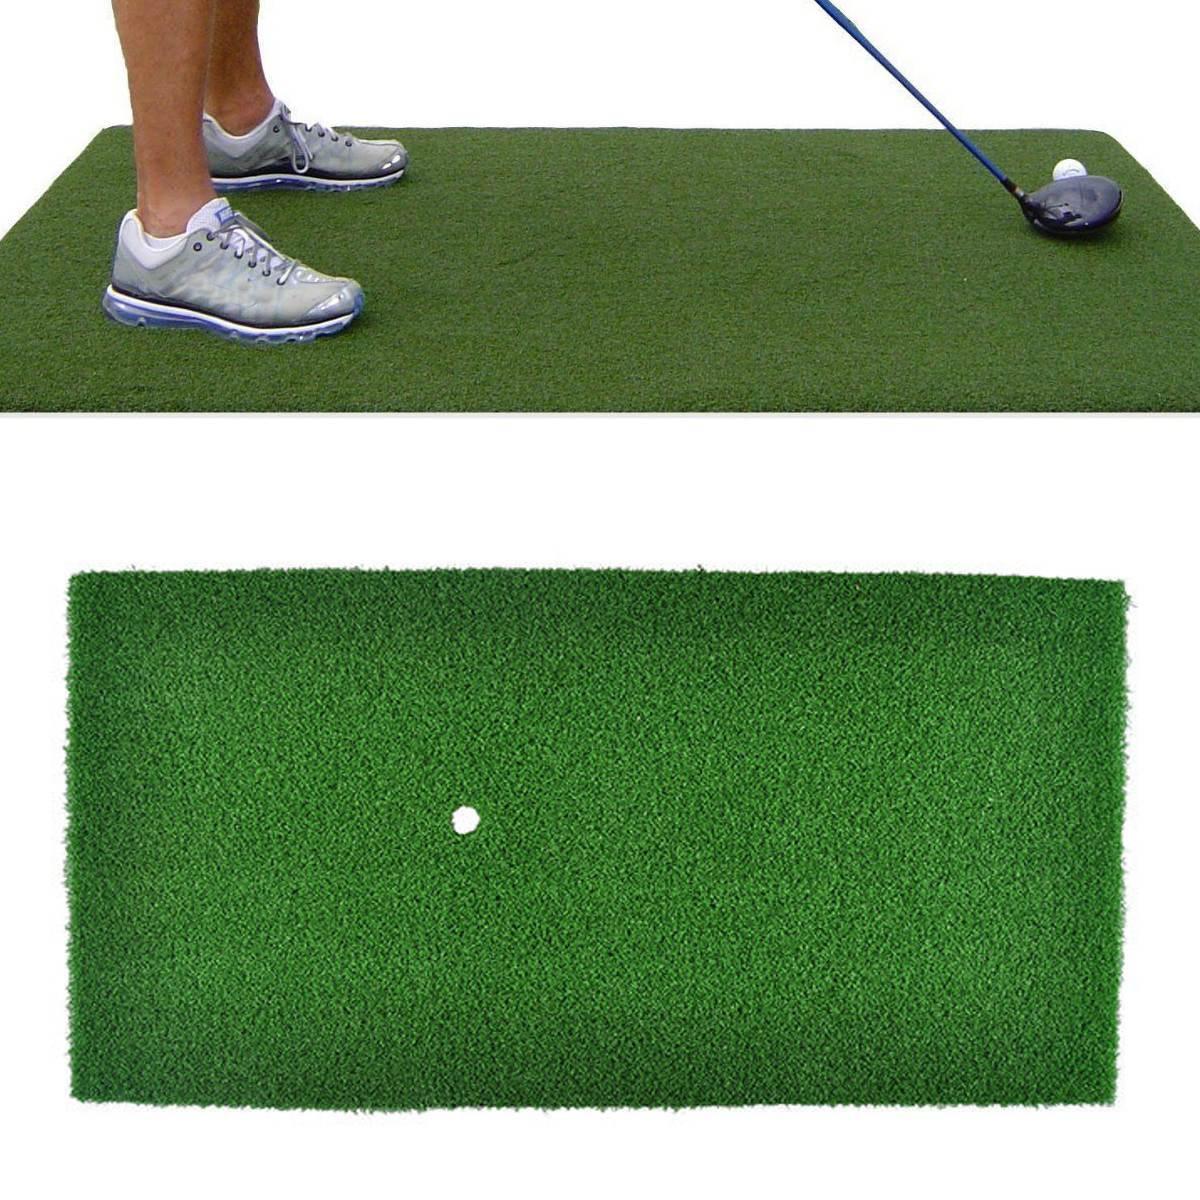 Backyard Golf Practice Mat Indoor Training Hitting Grass Driving Holder Protable